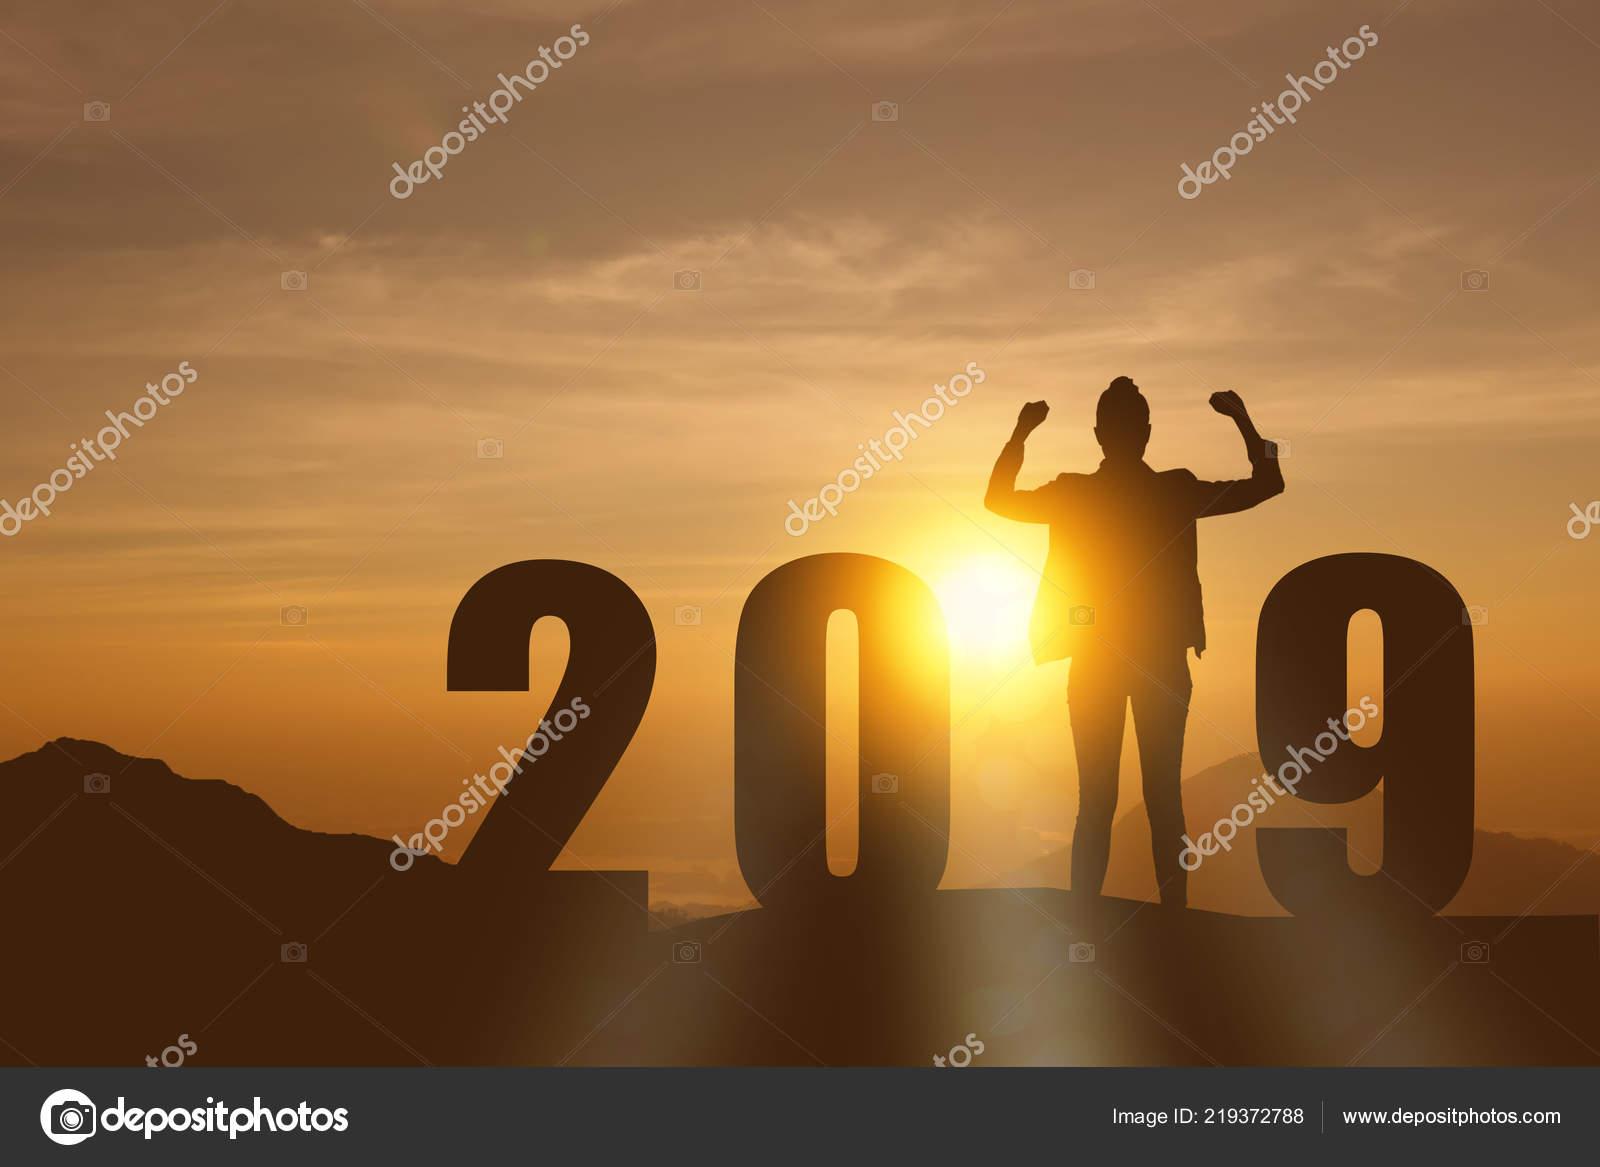 c73622516a2b Celebrando Año Nuevo 2019 Silueta Libertad Esperanza Joven ...